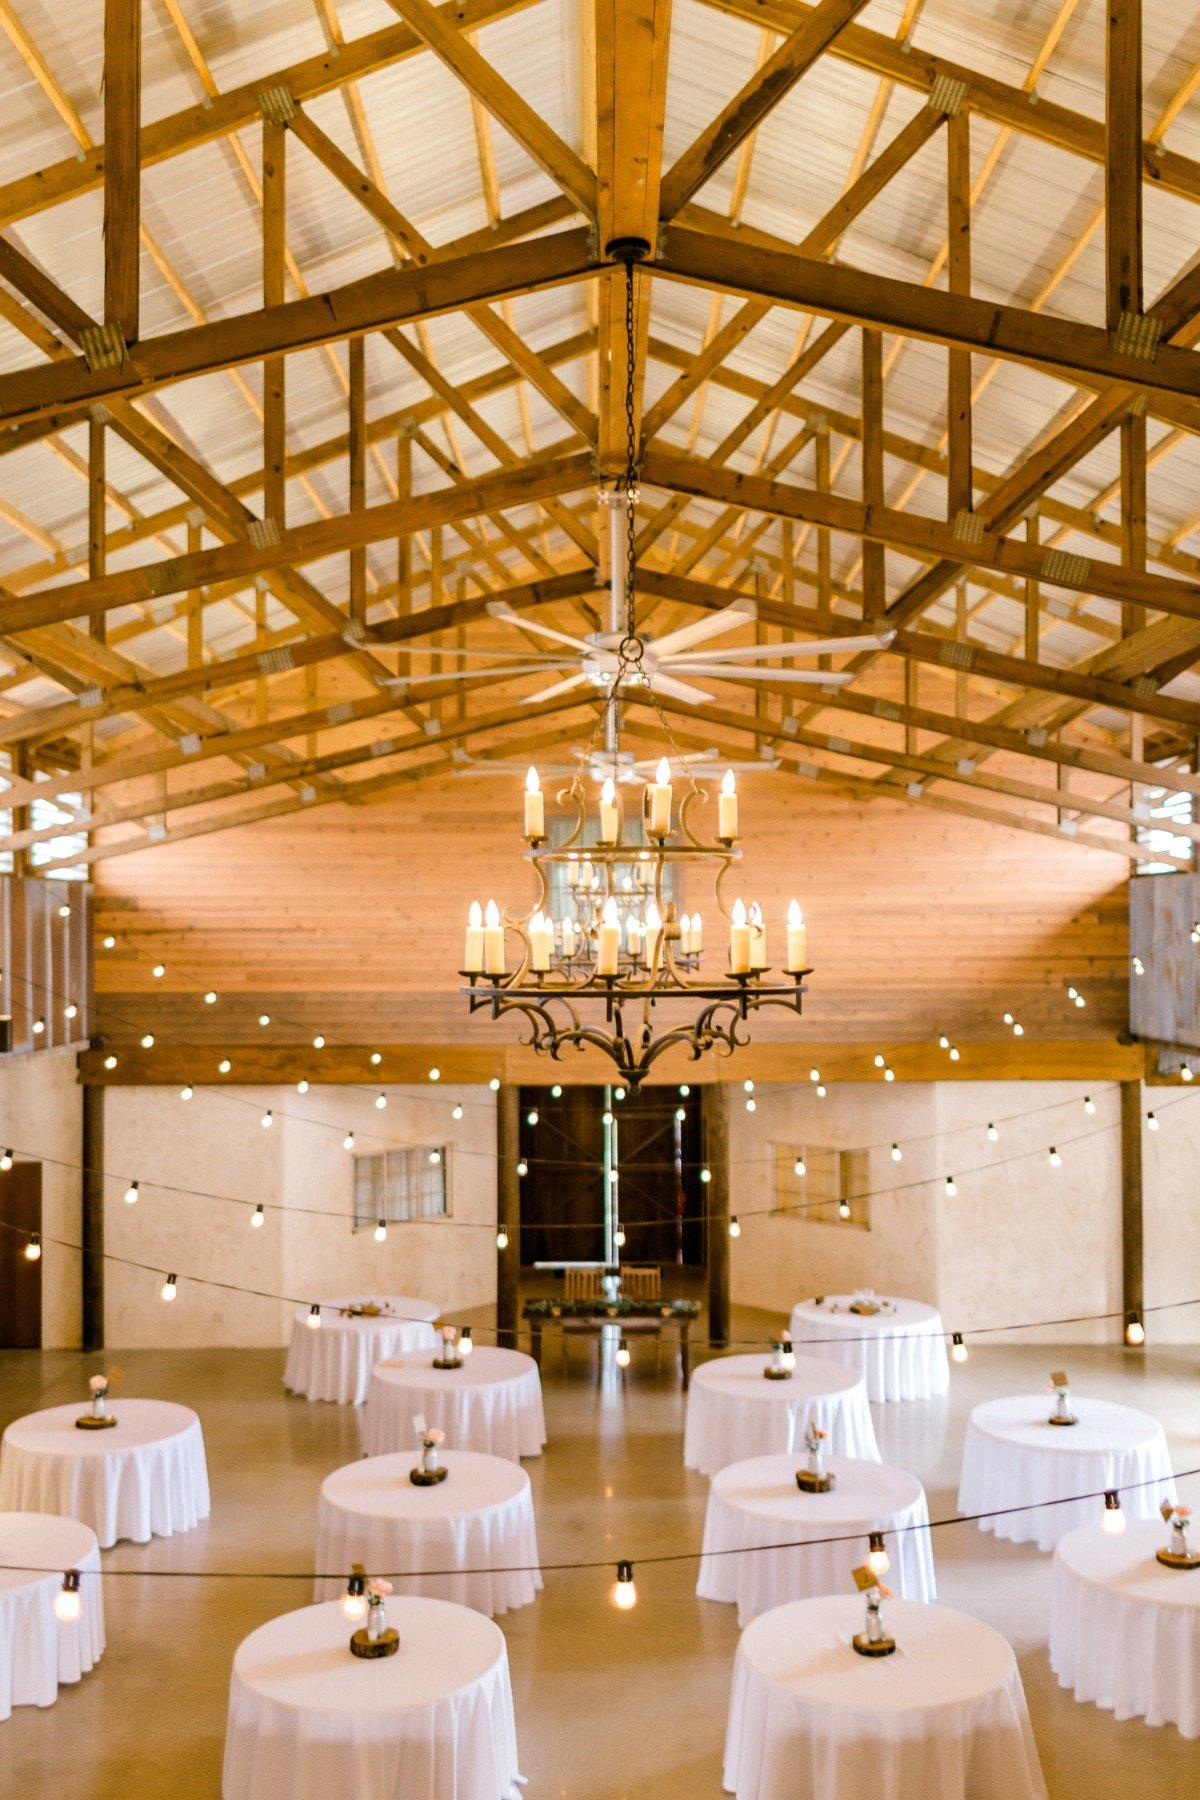 ennis-texas-wedding-photographer-kaitlyn-bullard-55.jpg